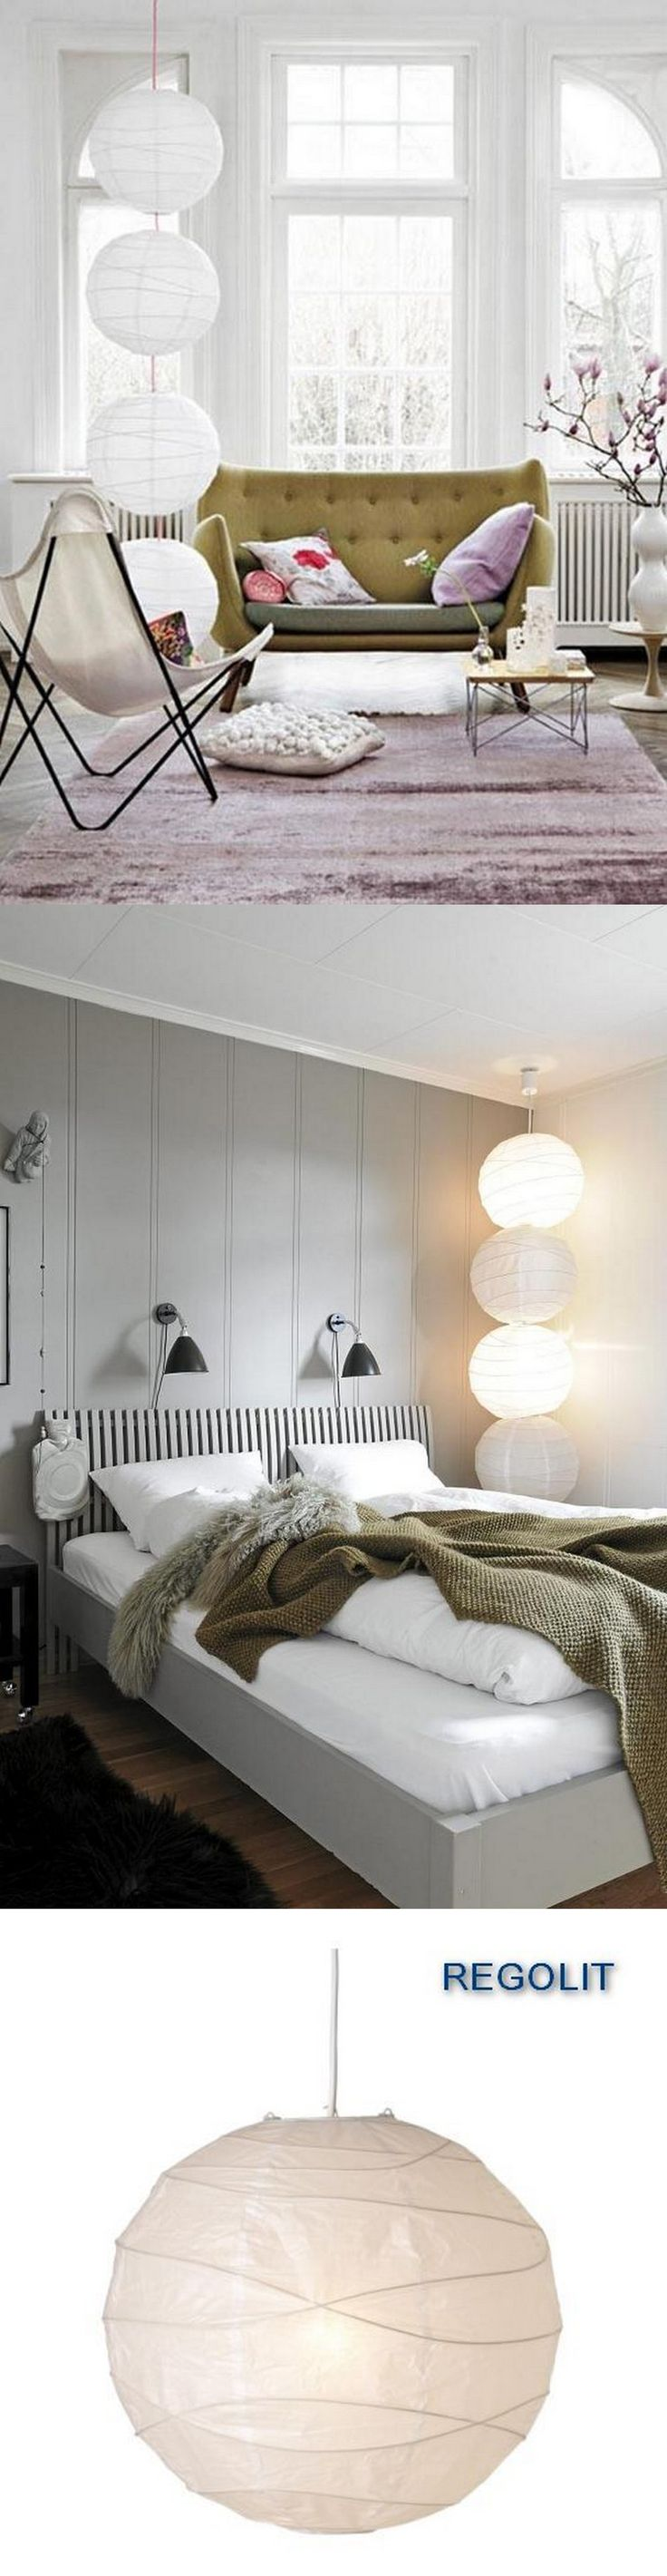 Ideas para REGOLIT de IKEA